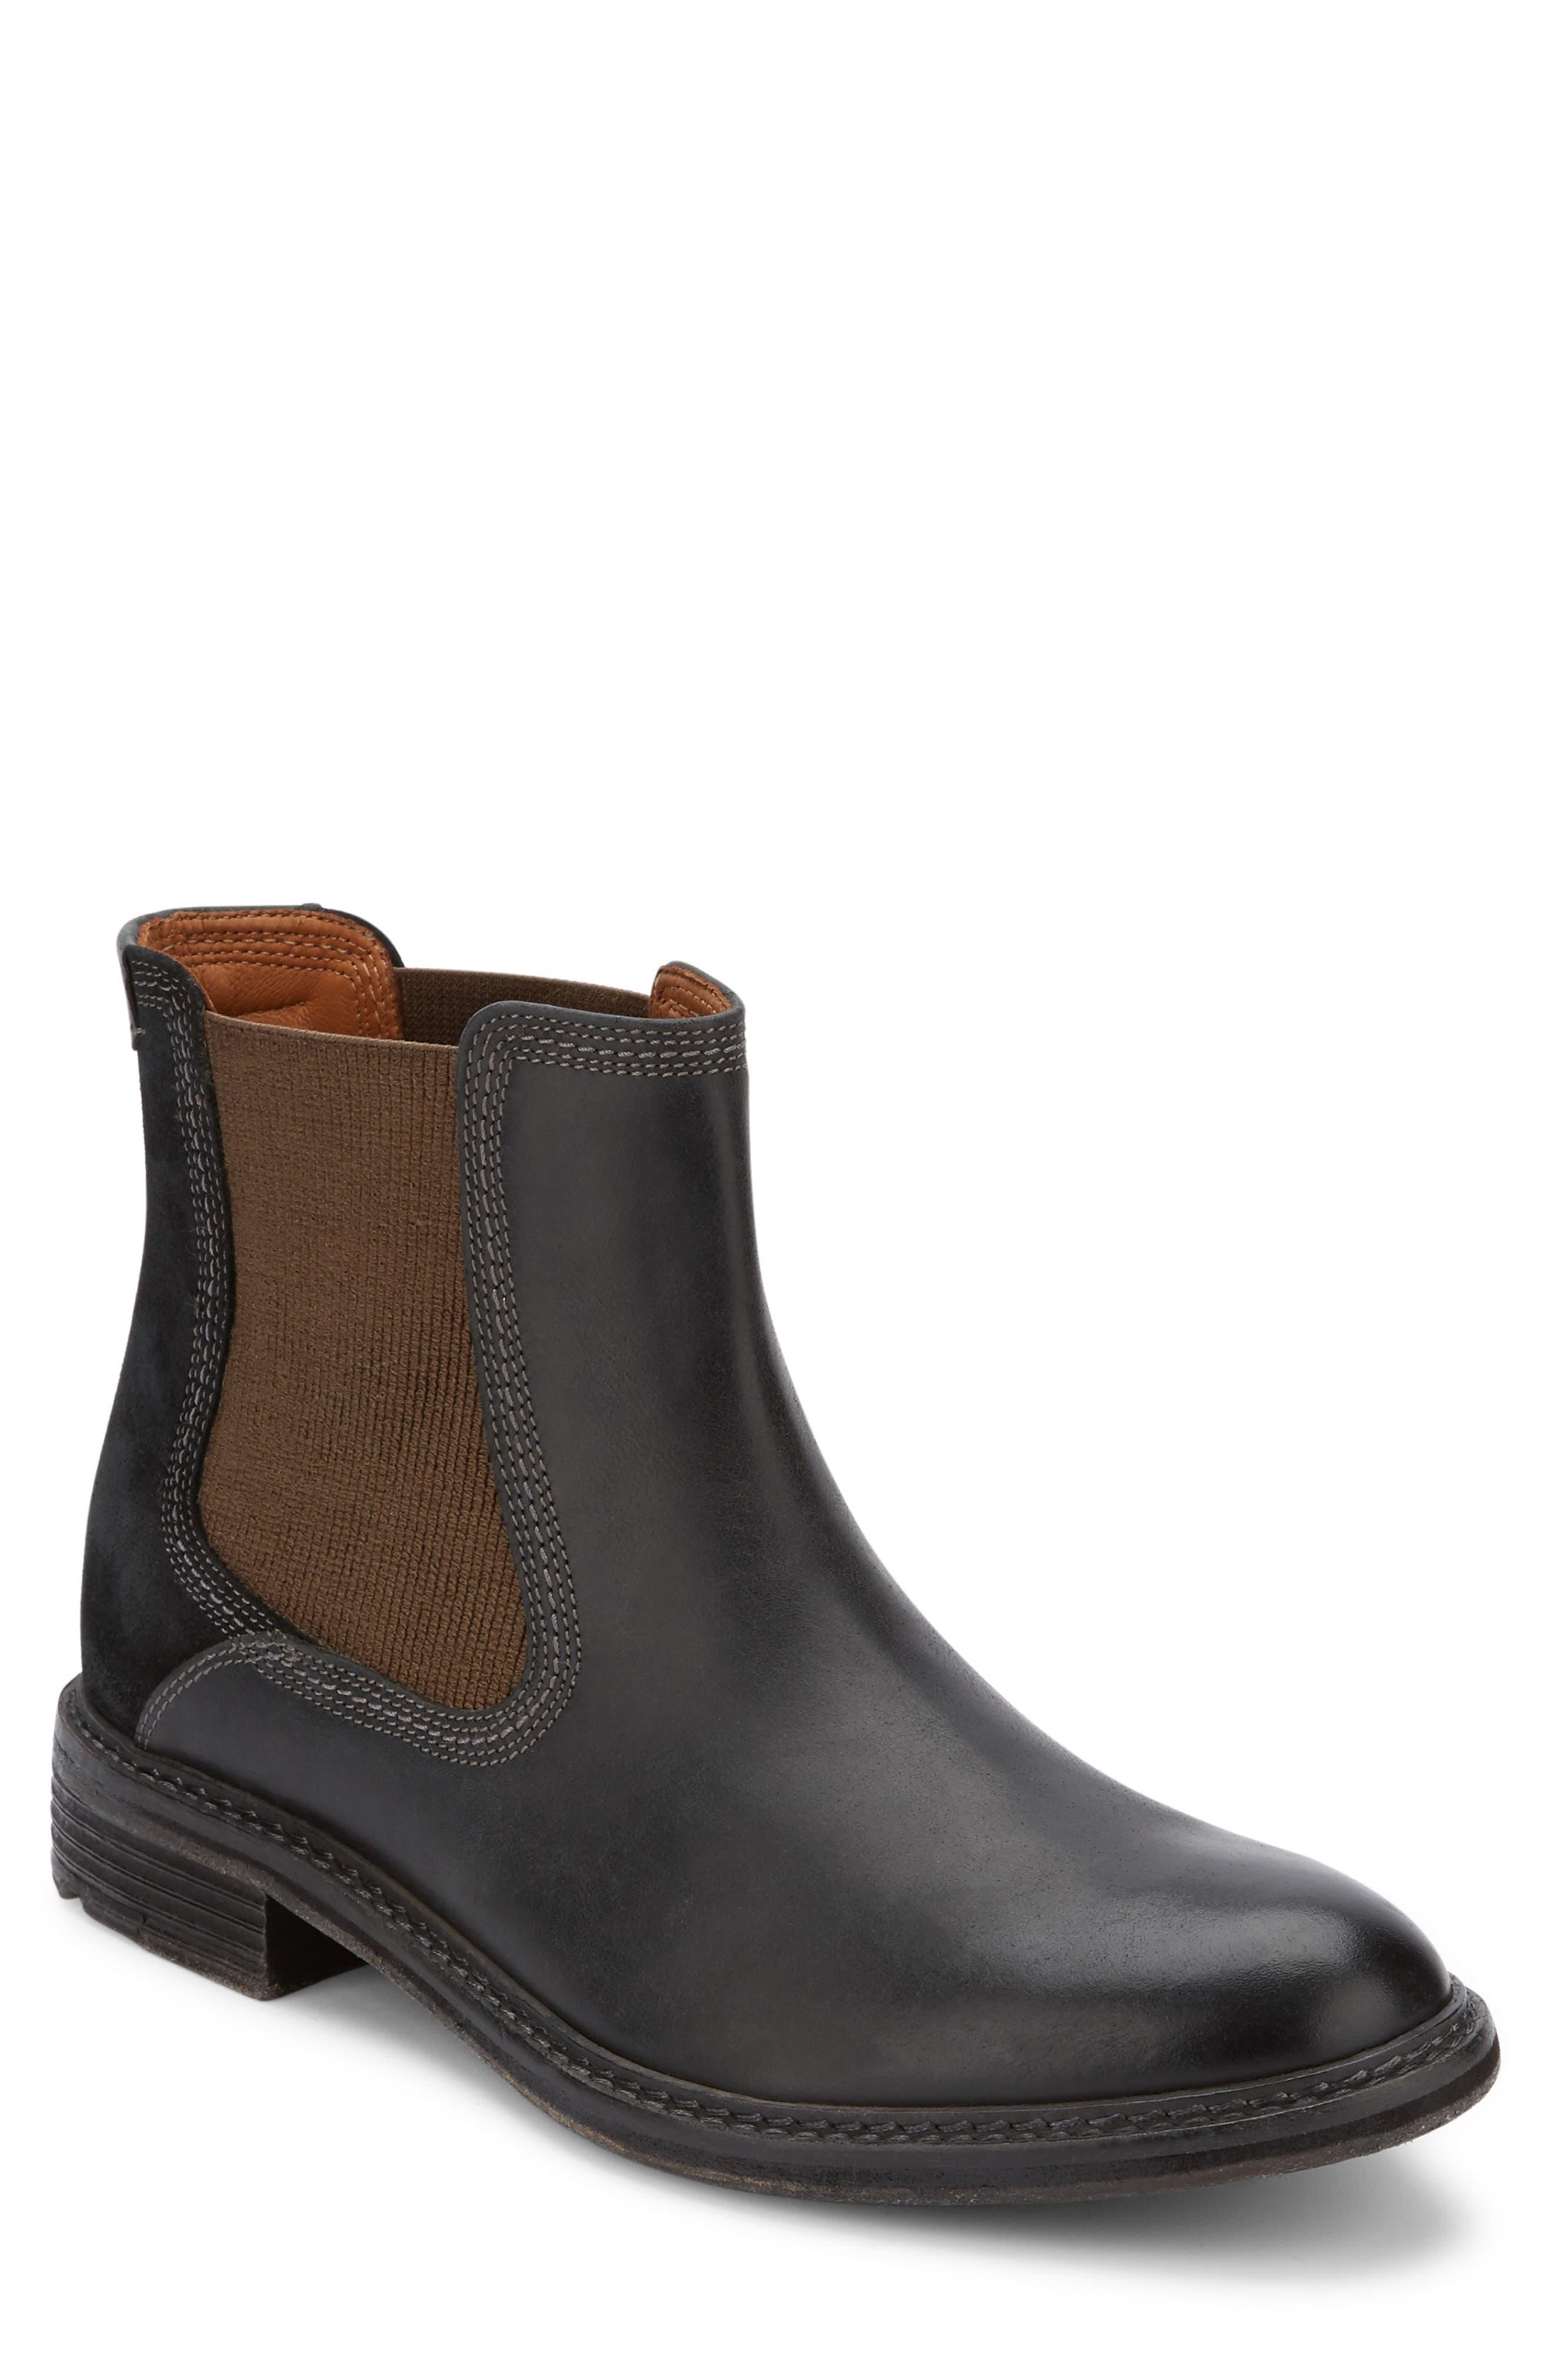 Hendrick Chelsea Boot,                         Main,                         color, 001